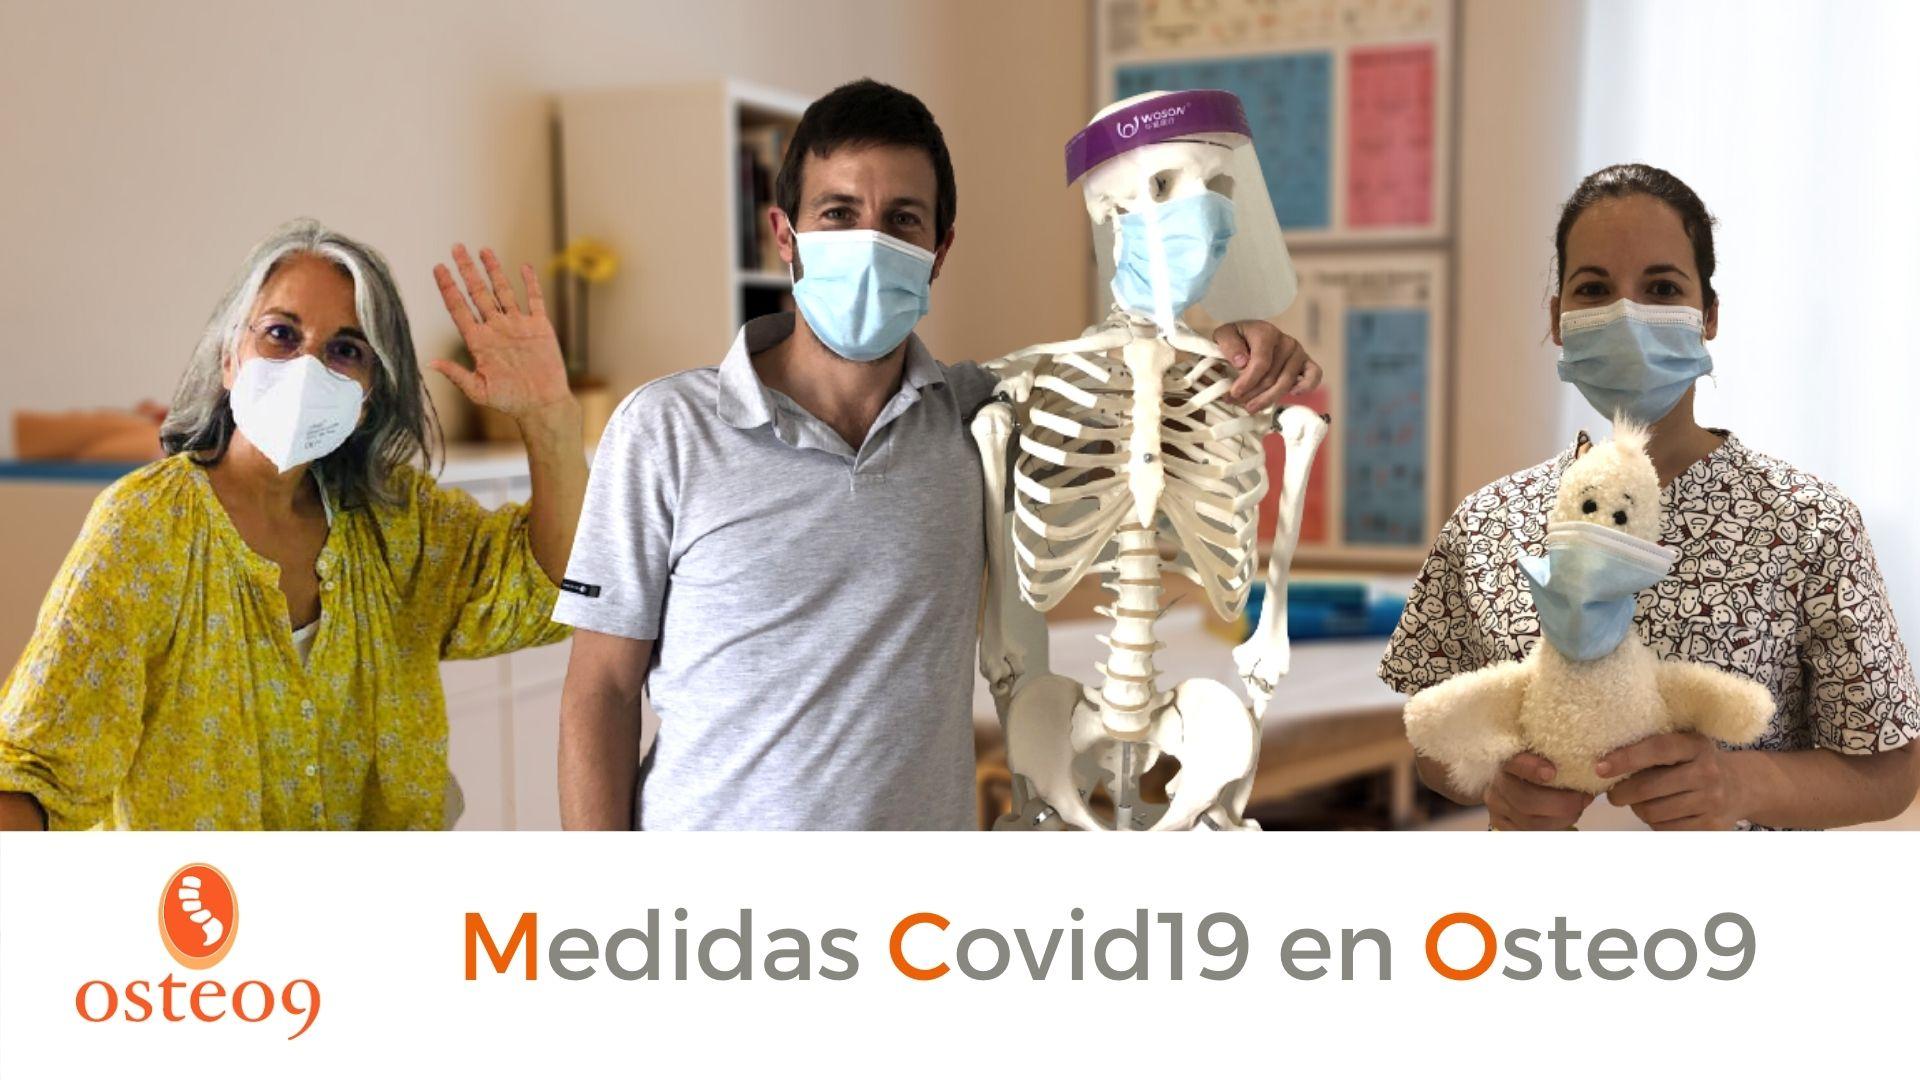 Mesures Covid-19 a Osteo9